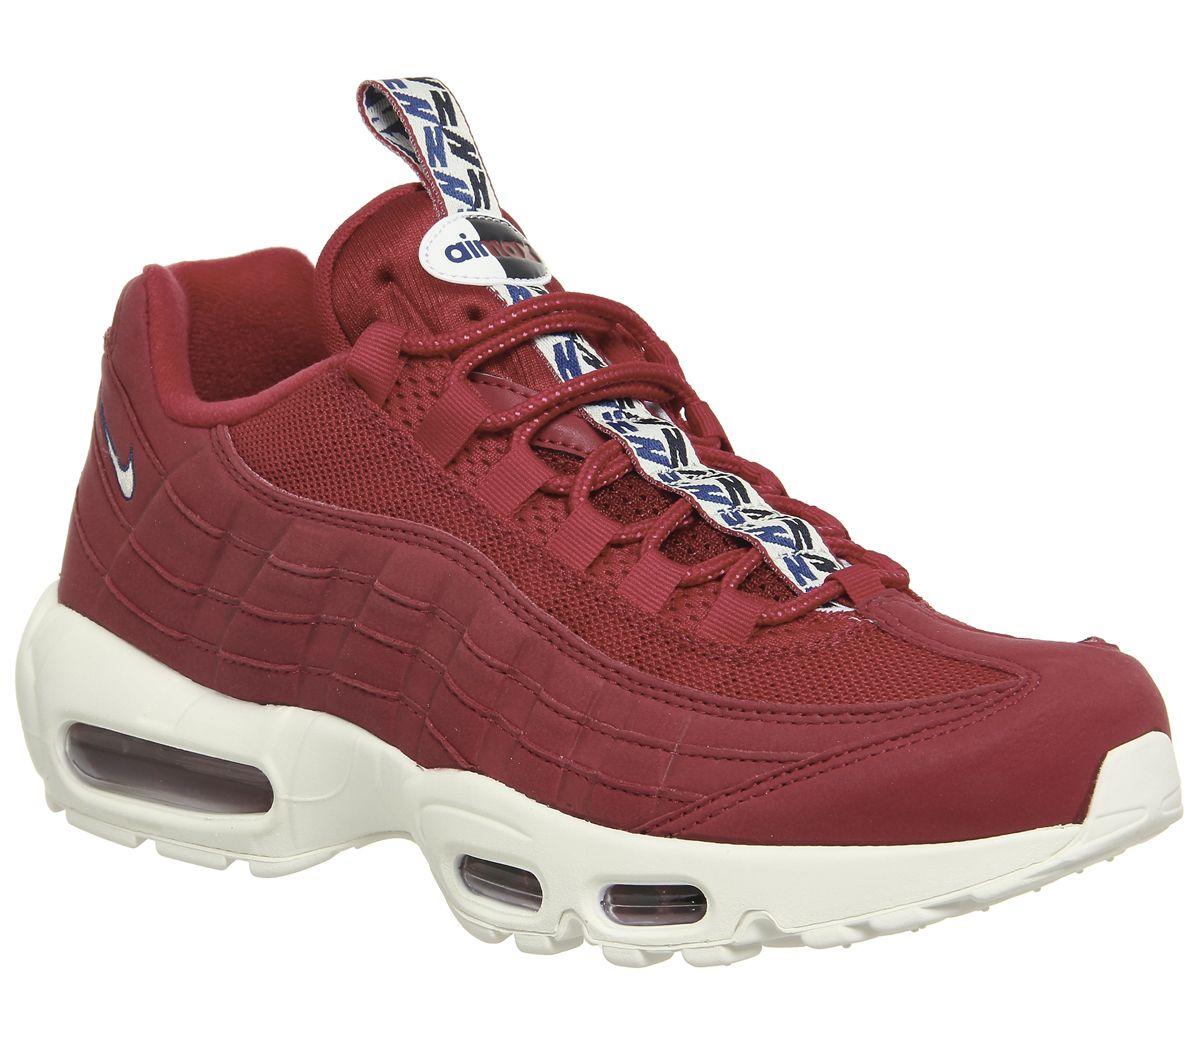 1a8f3e2637 Nike Air Max 95 Gym Red Sail - His trainers